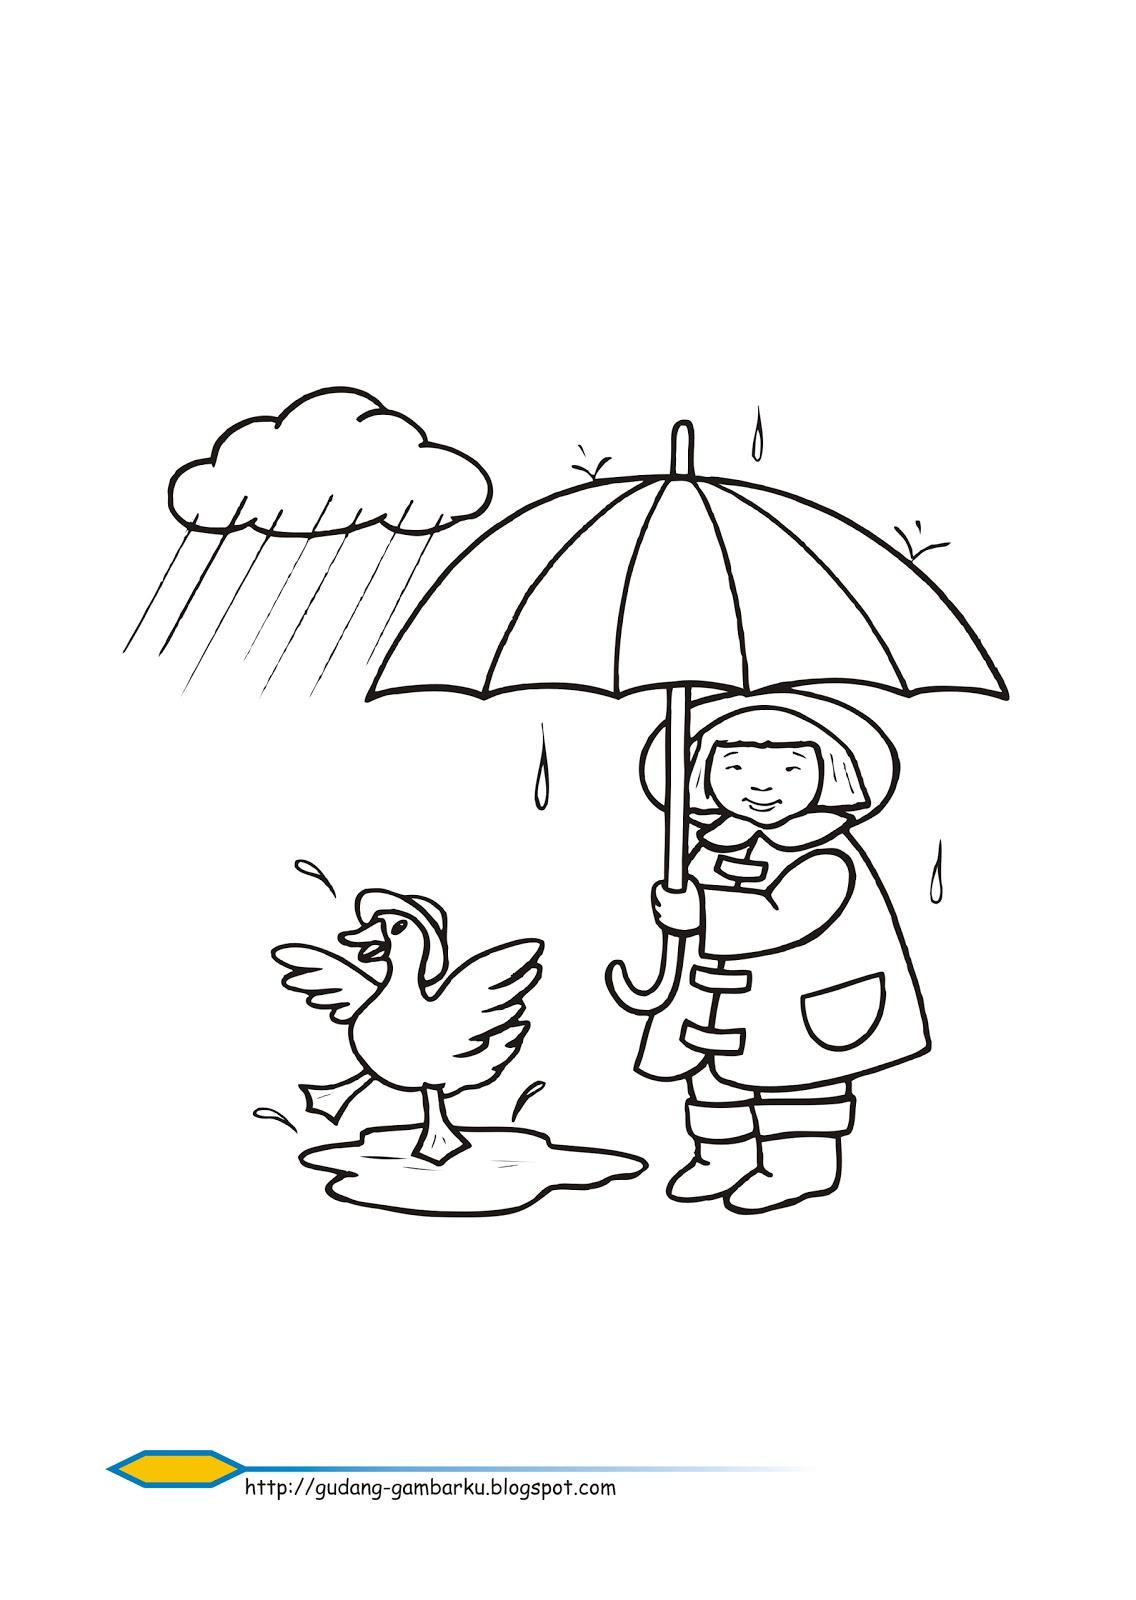 Catatanku Anak Desa Gambar Mewarnai Hujan